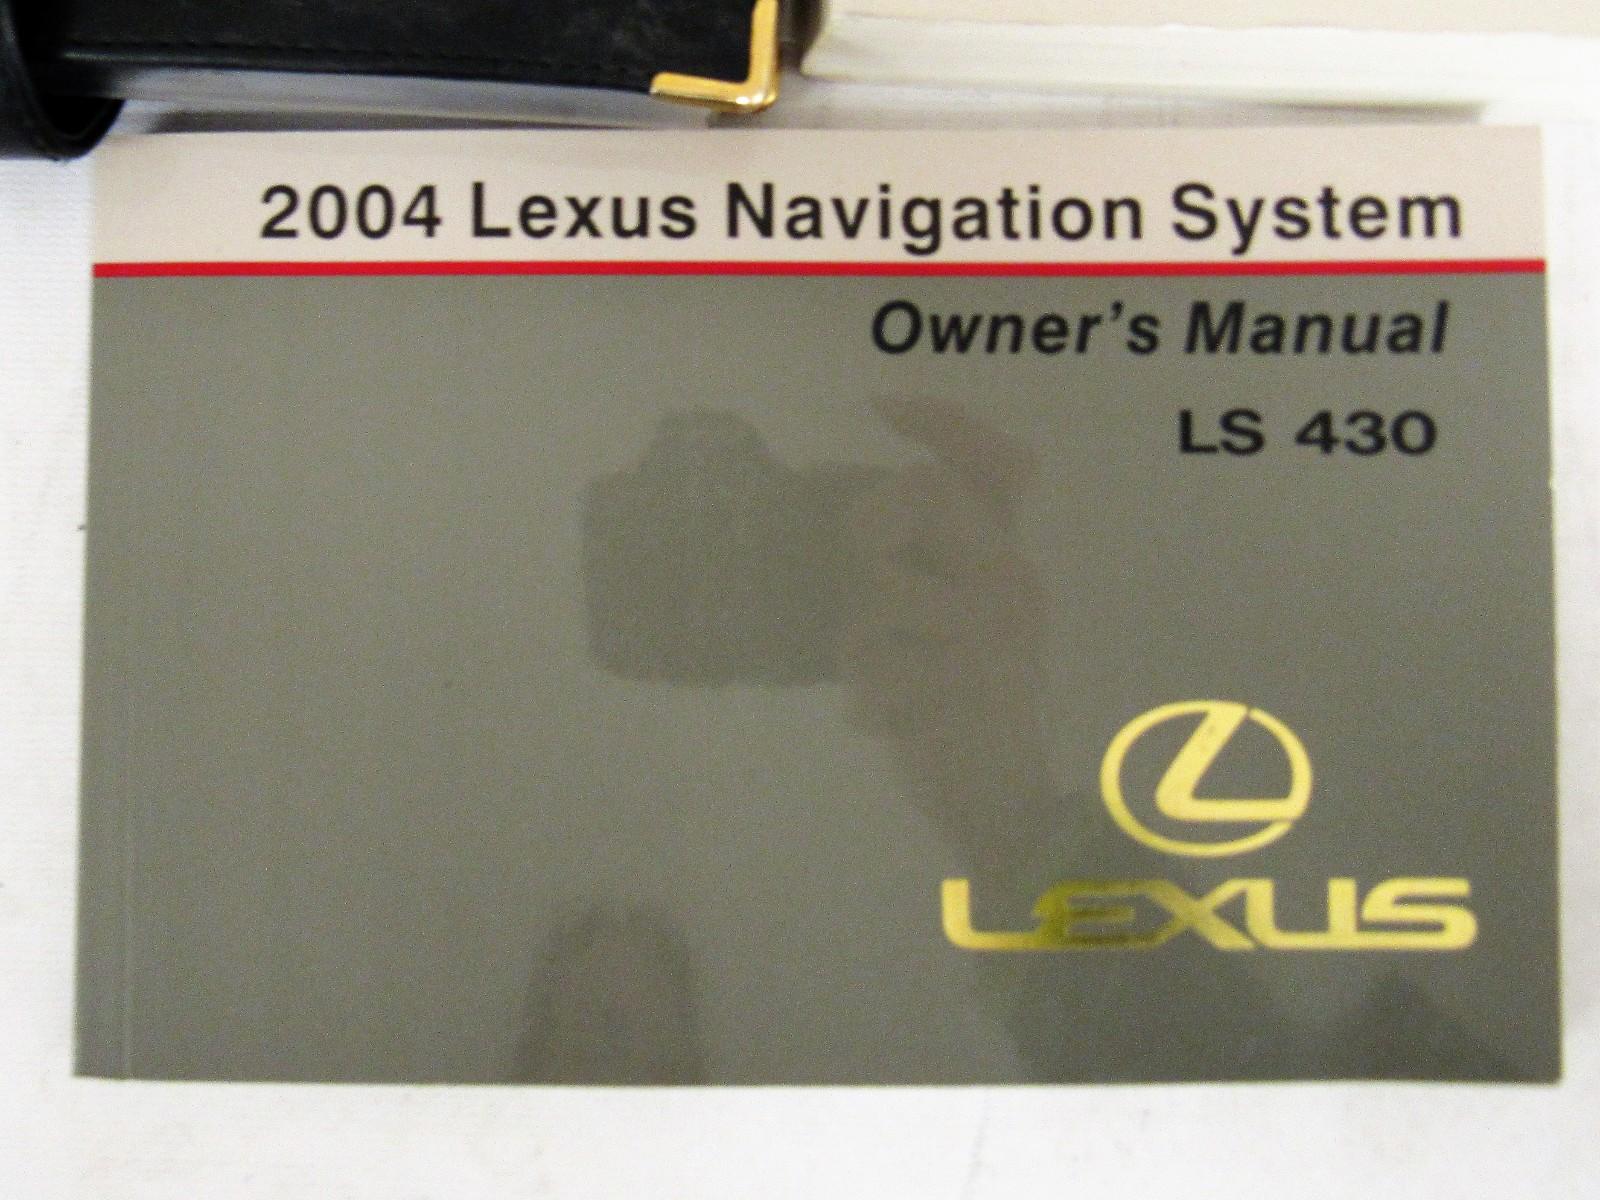 2004 lexus ls 430 owners manual book bashful yak rh bashfulyak com 2004 lexus ls430 repair manual 2004 lexus ls430 repair manual